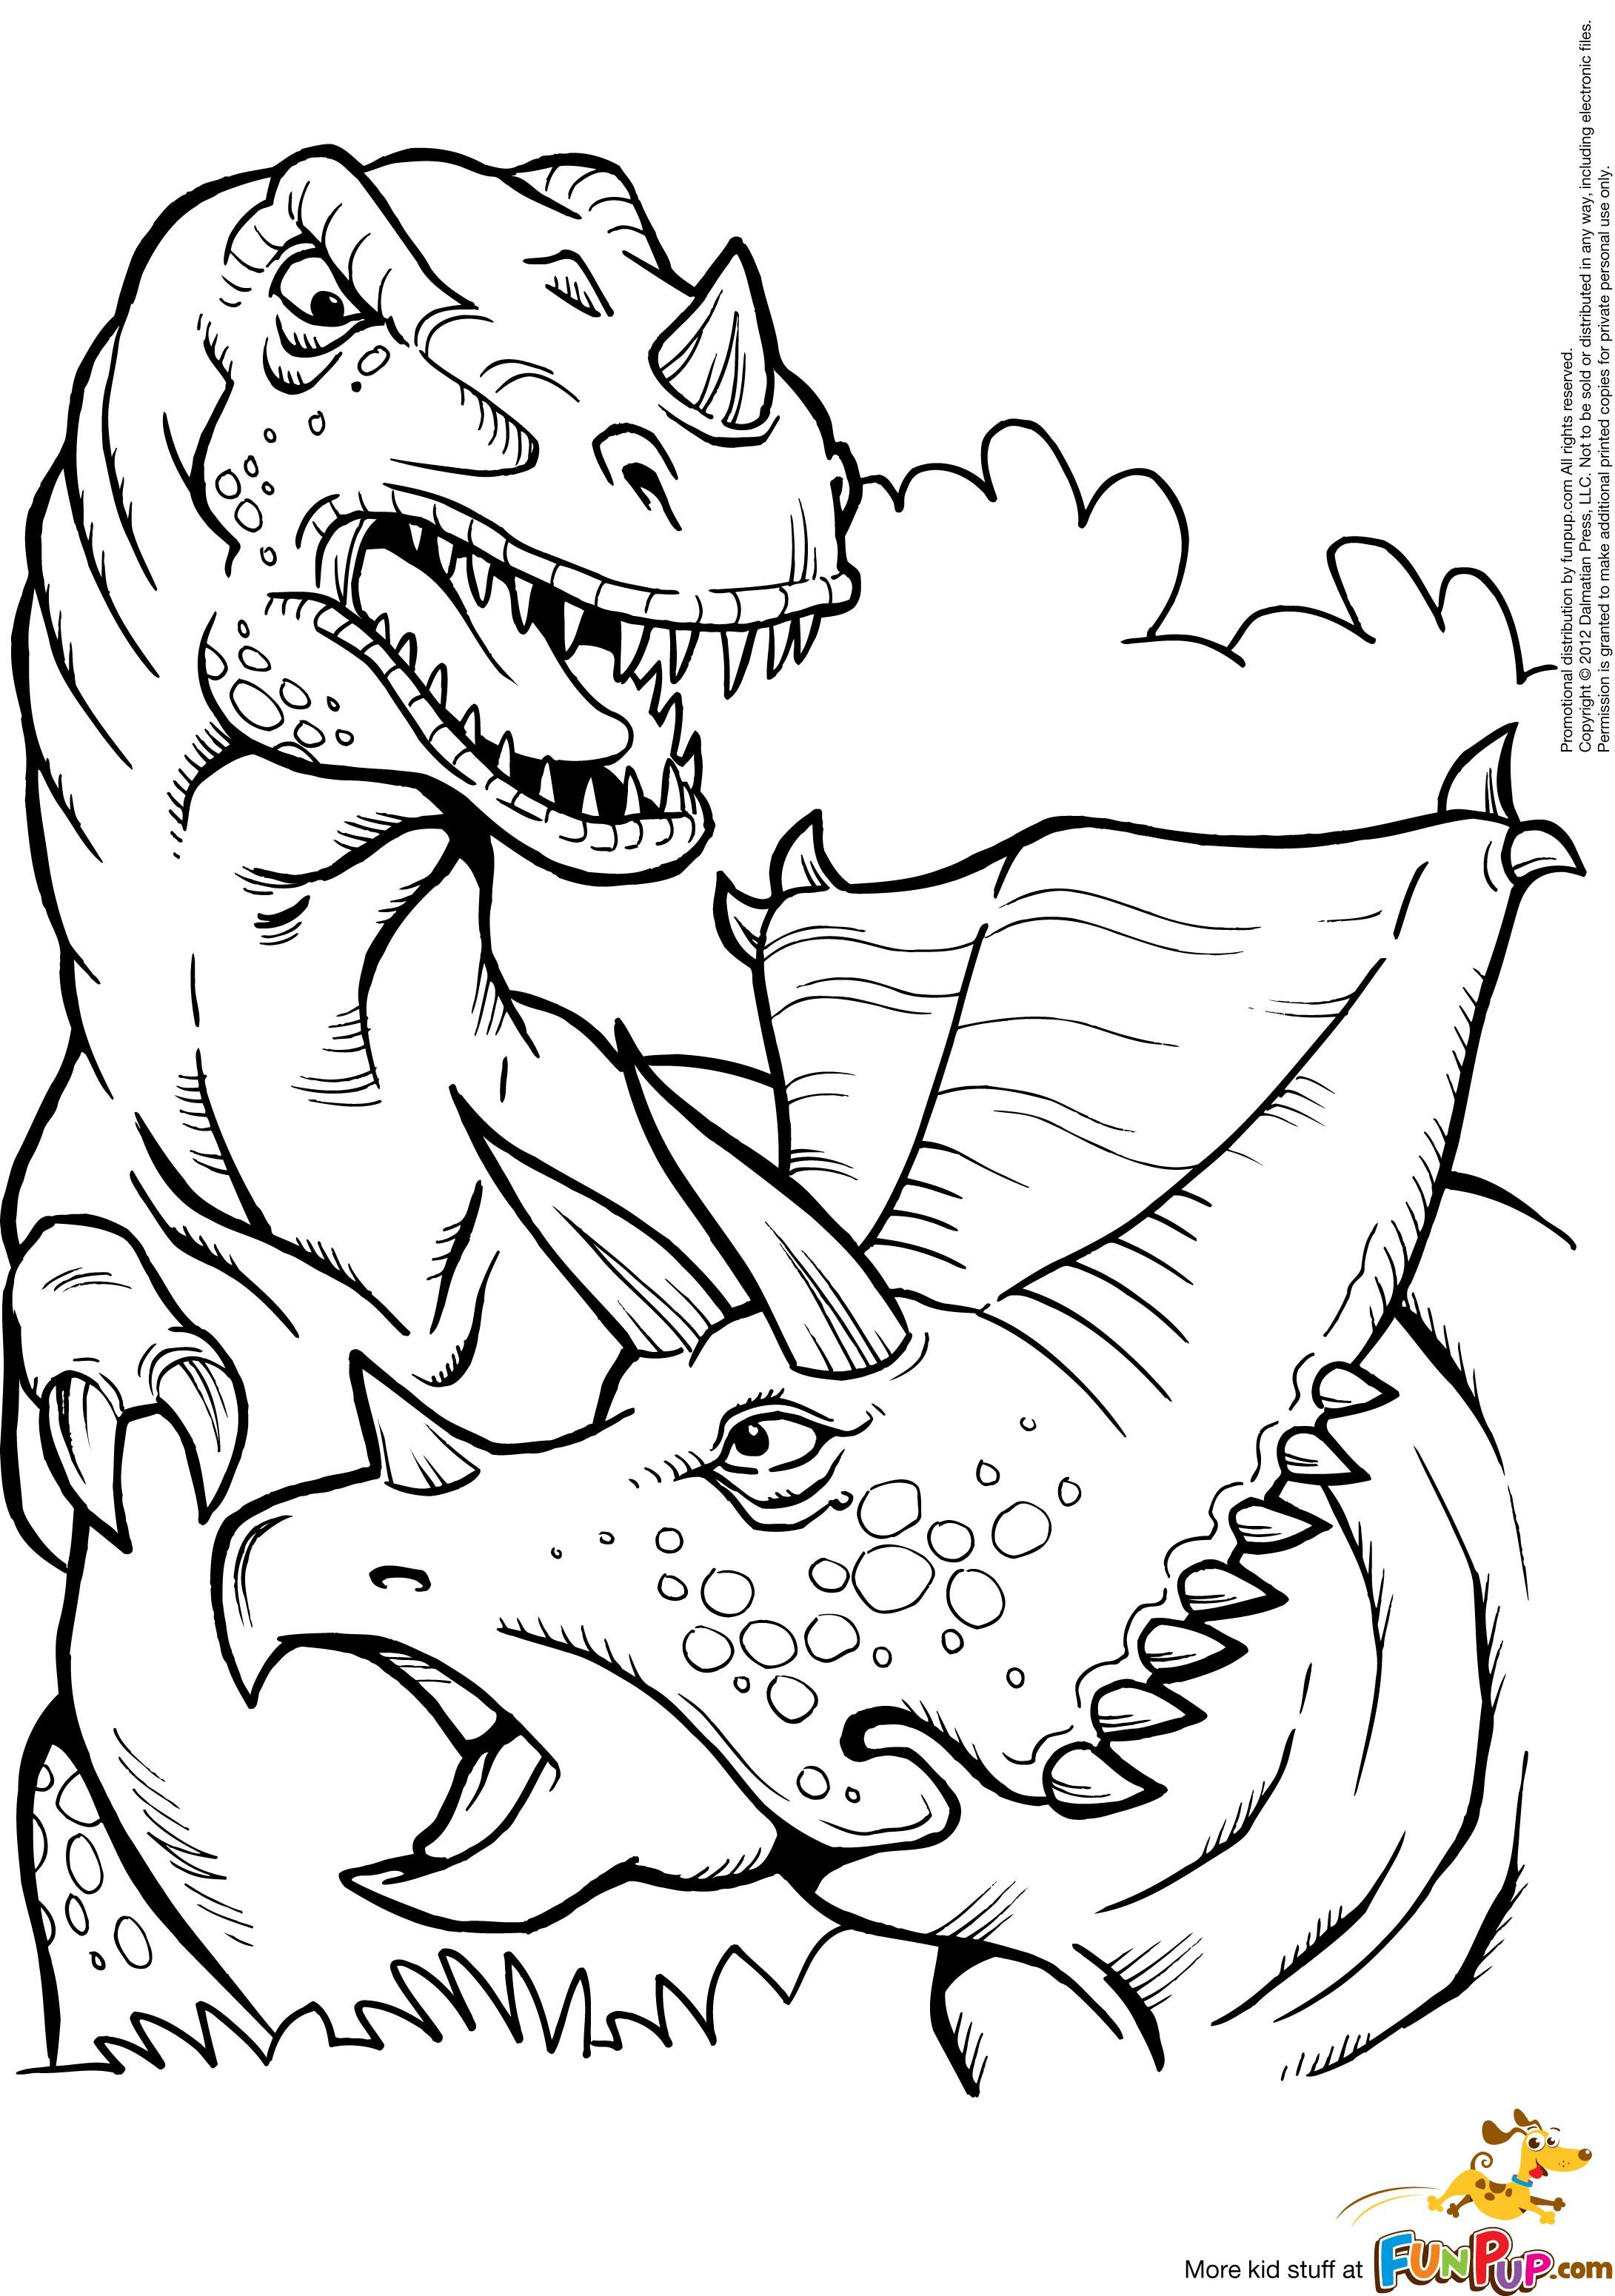 2181x3101 Kleurplaat Printable T Rex And Triceratops Coloring Page